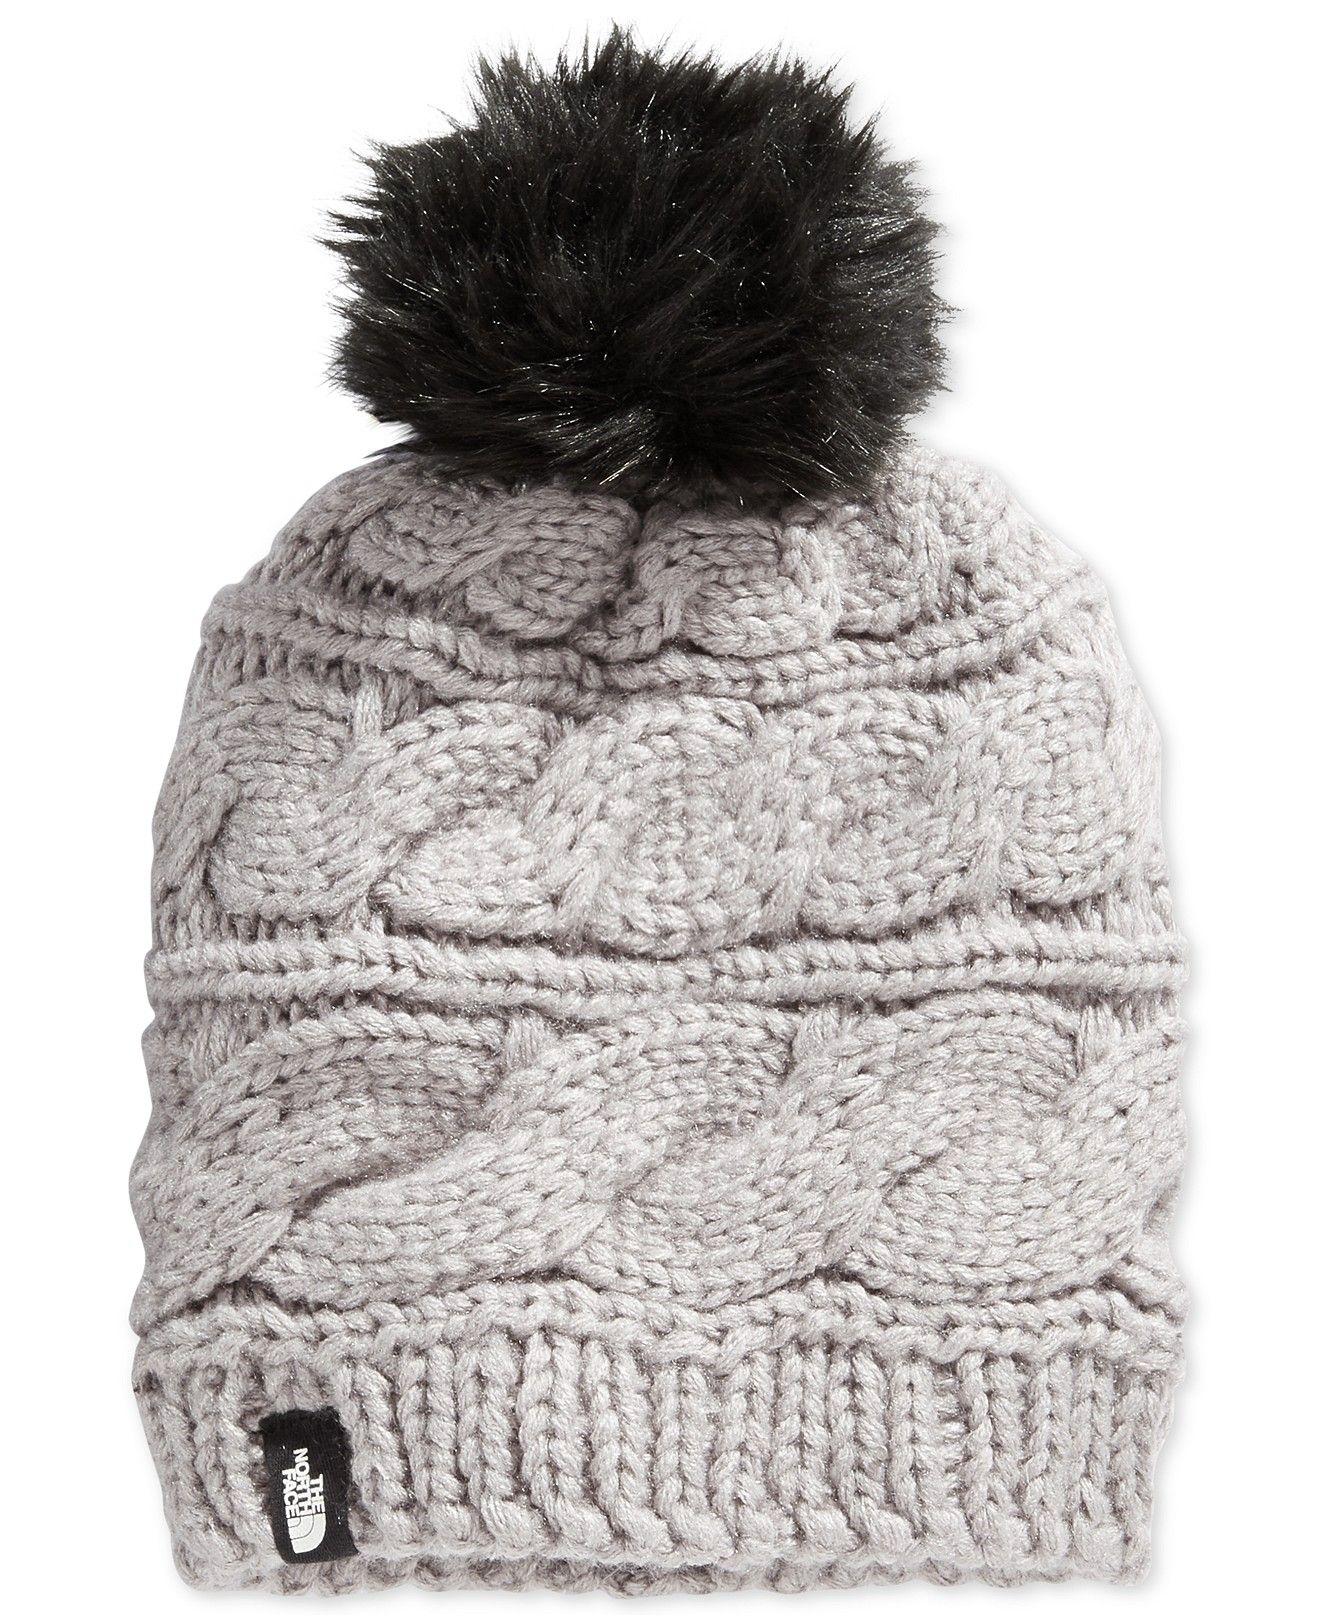 e6cbdd9d67f7e The North Face Faux-Fur-Trim Pom Pom Hat - Women - Macy s